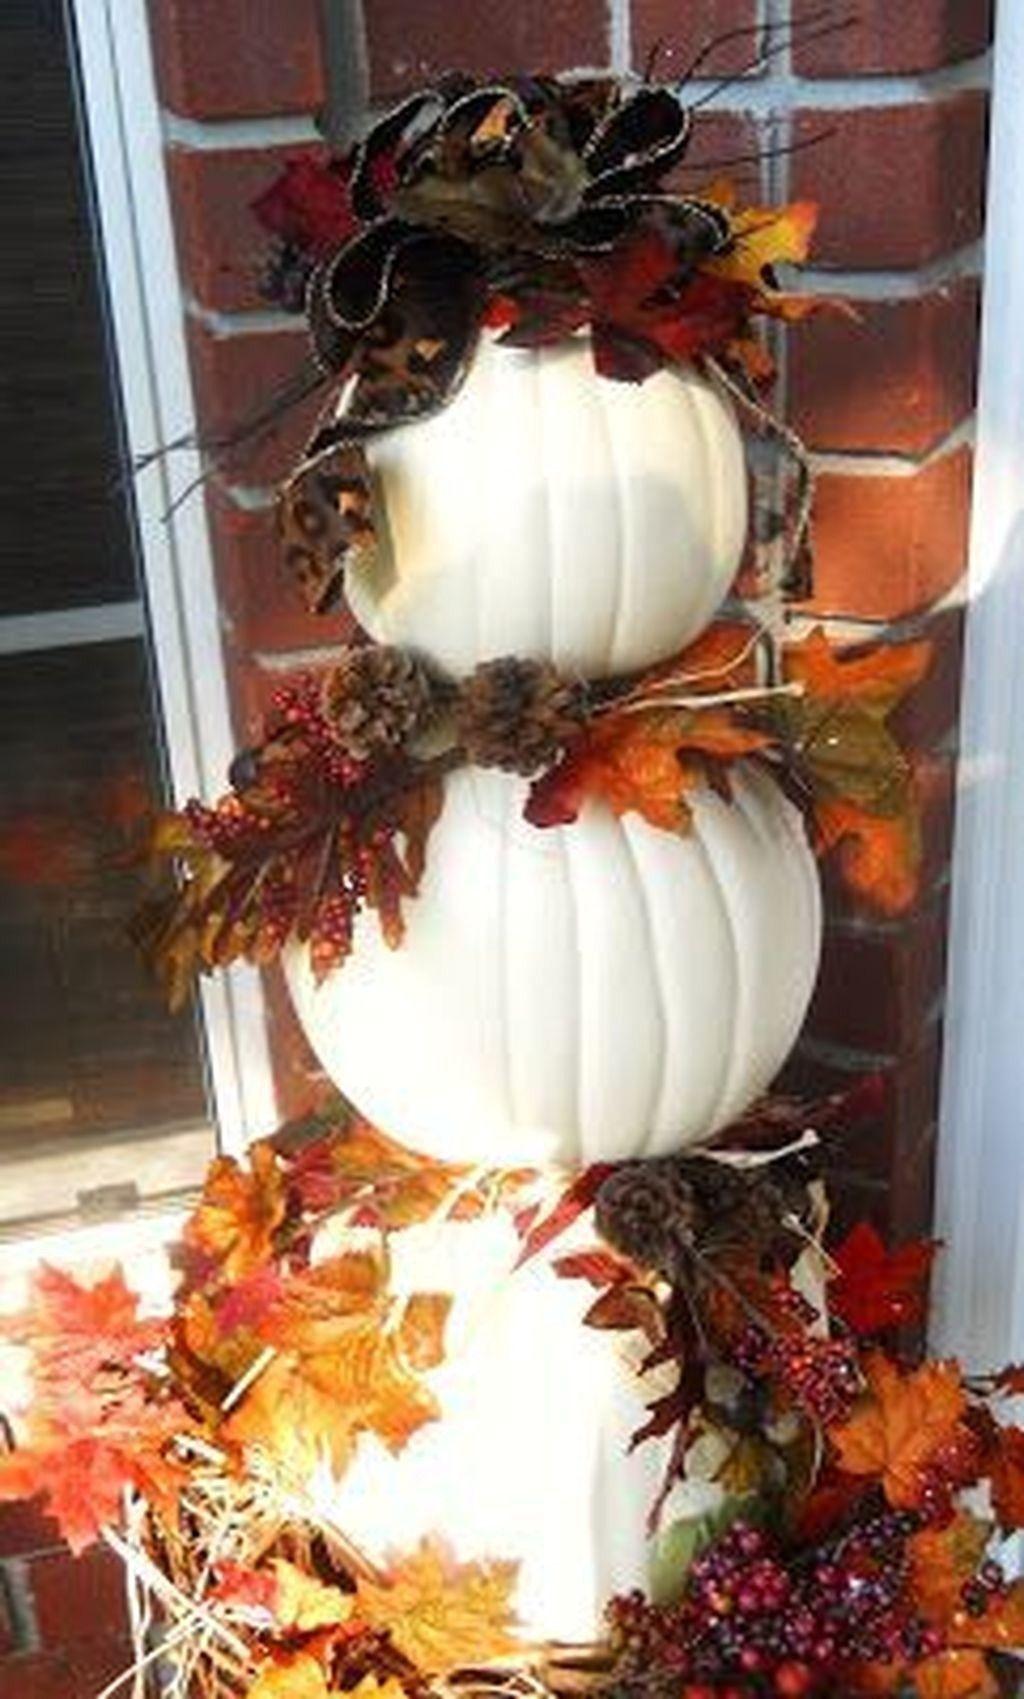 Amazing Diy Fall Pumpkin Topiary For Home Decor Ideas Frugal Living Fall Thanksgiving Decor Fall Decor Diy Fall Halloween Decor